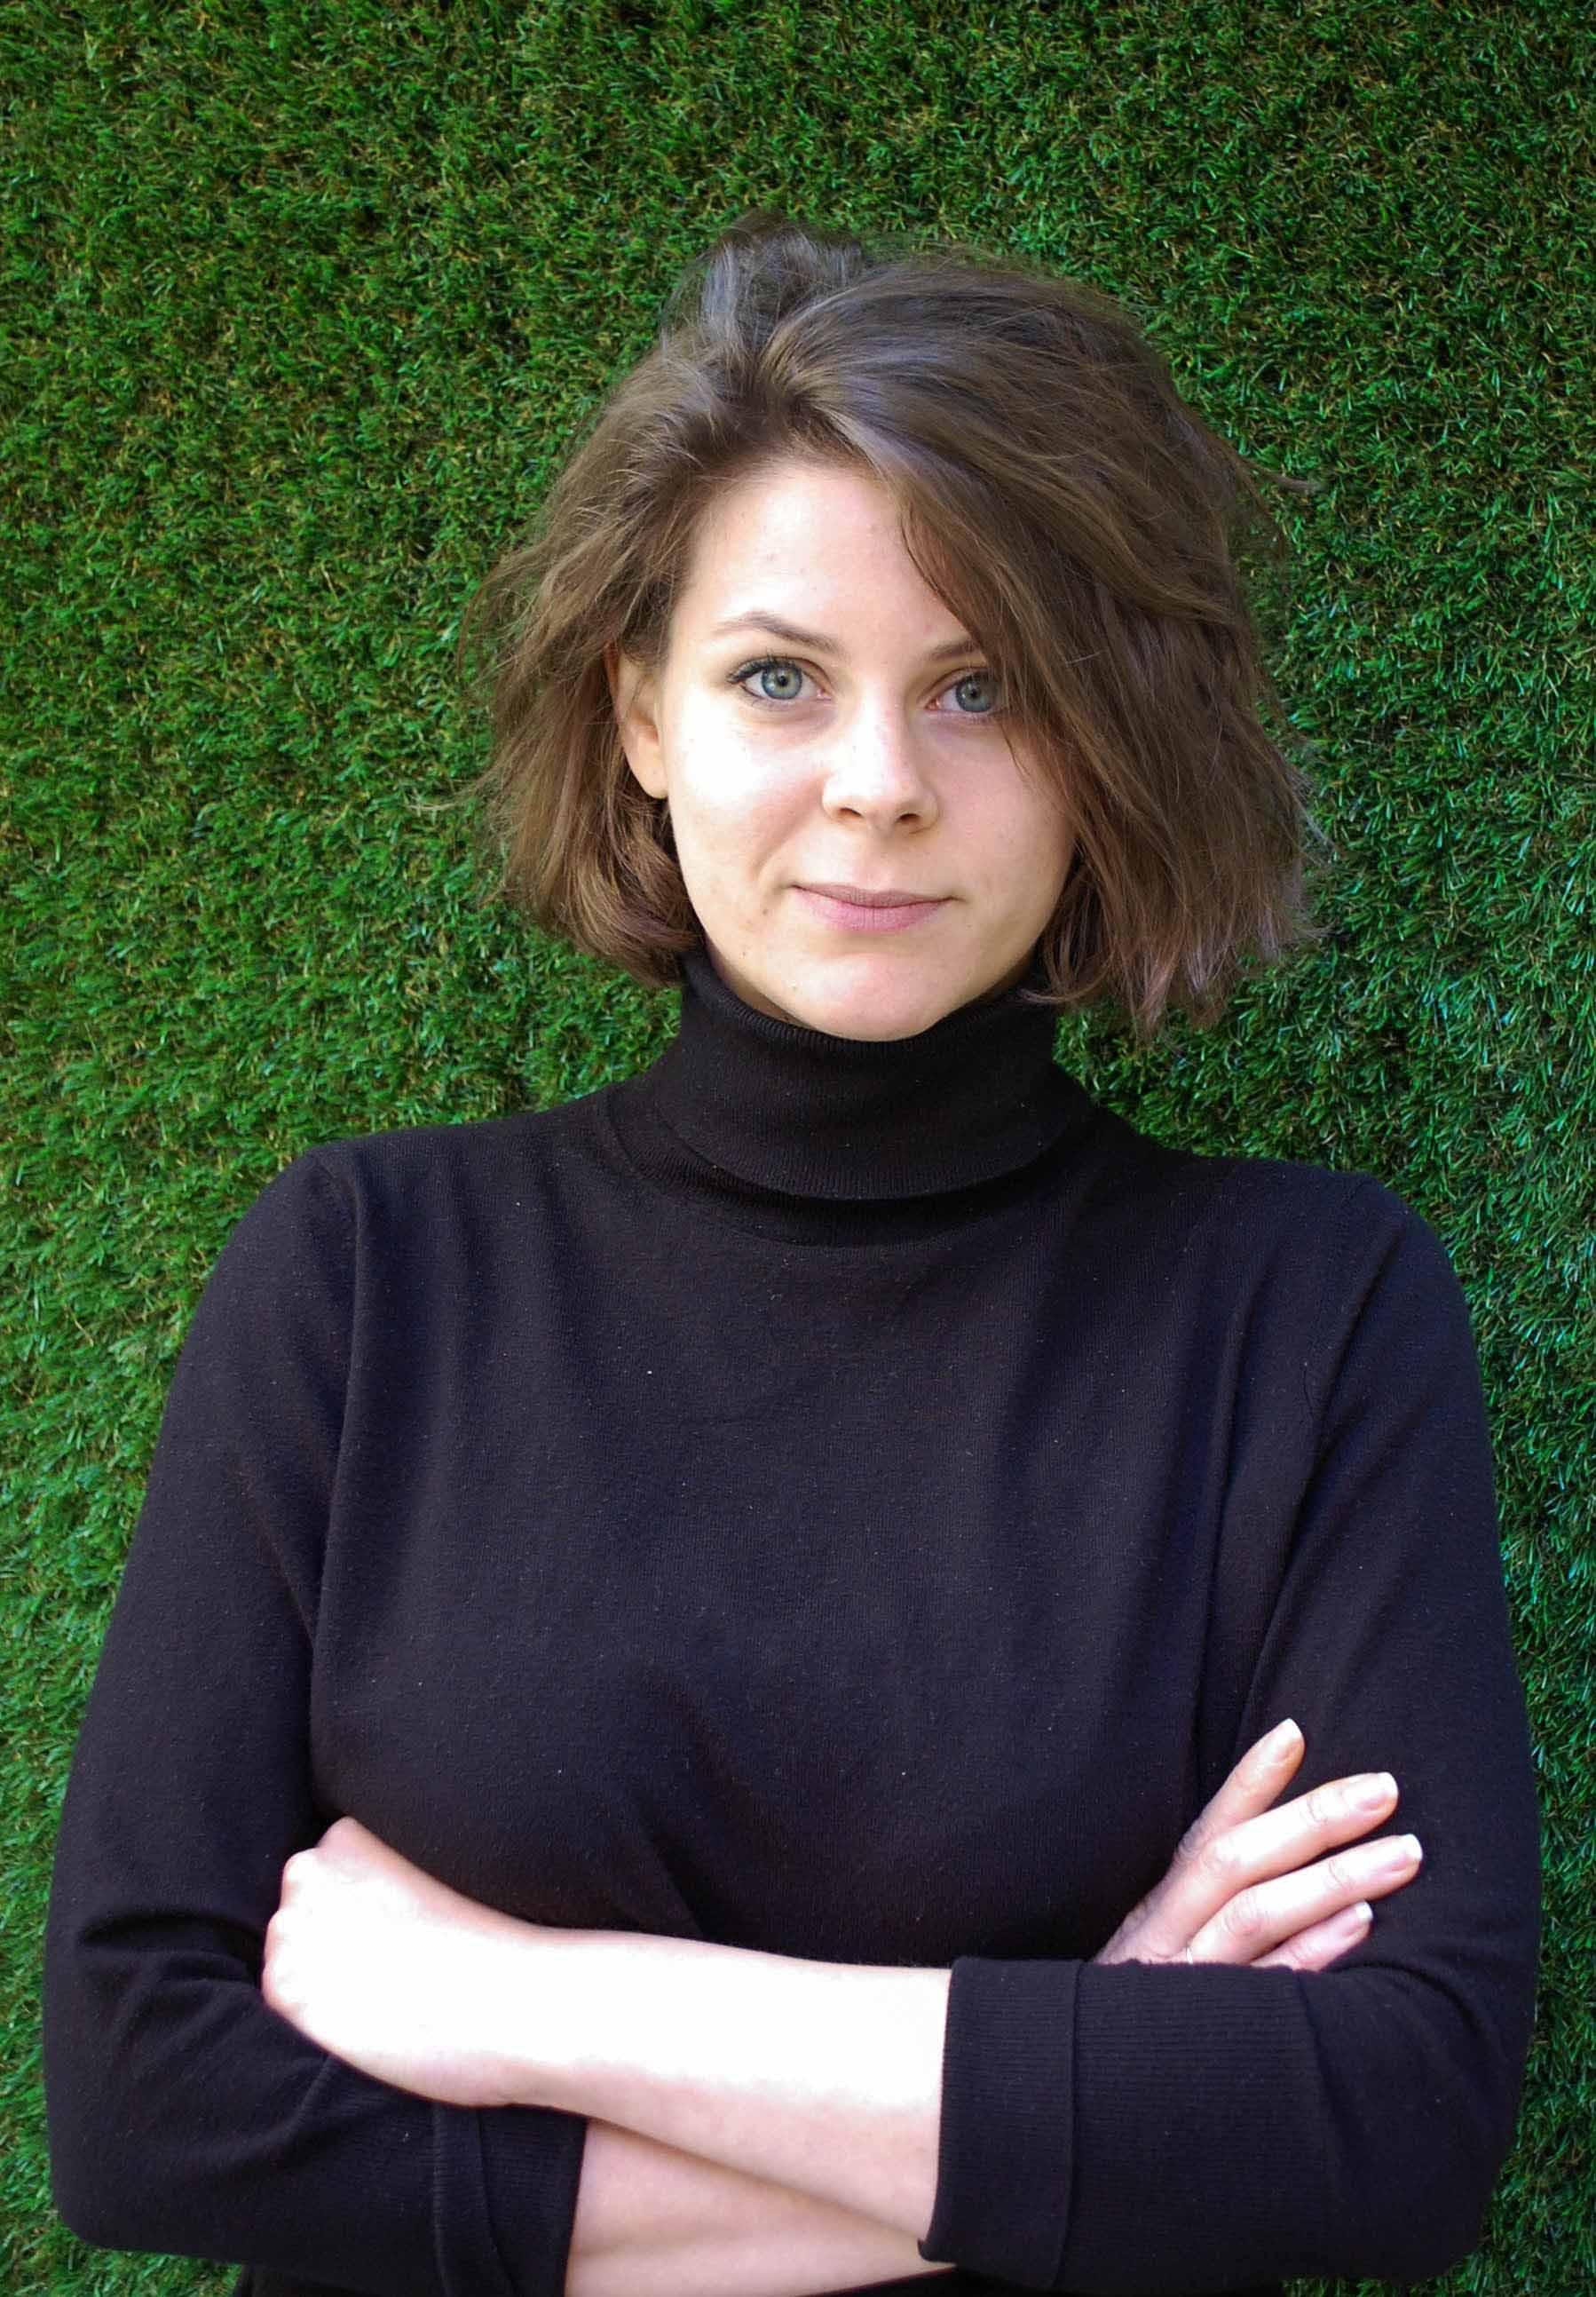 Martina Atanasovska Pianificatore